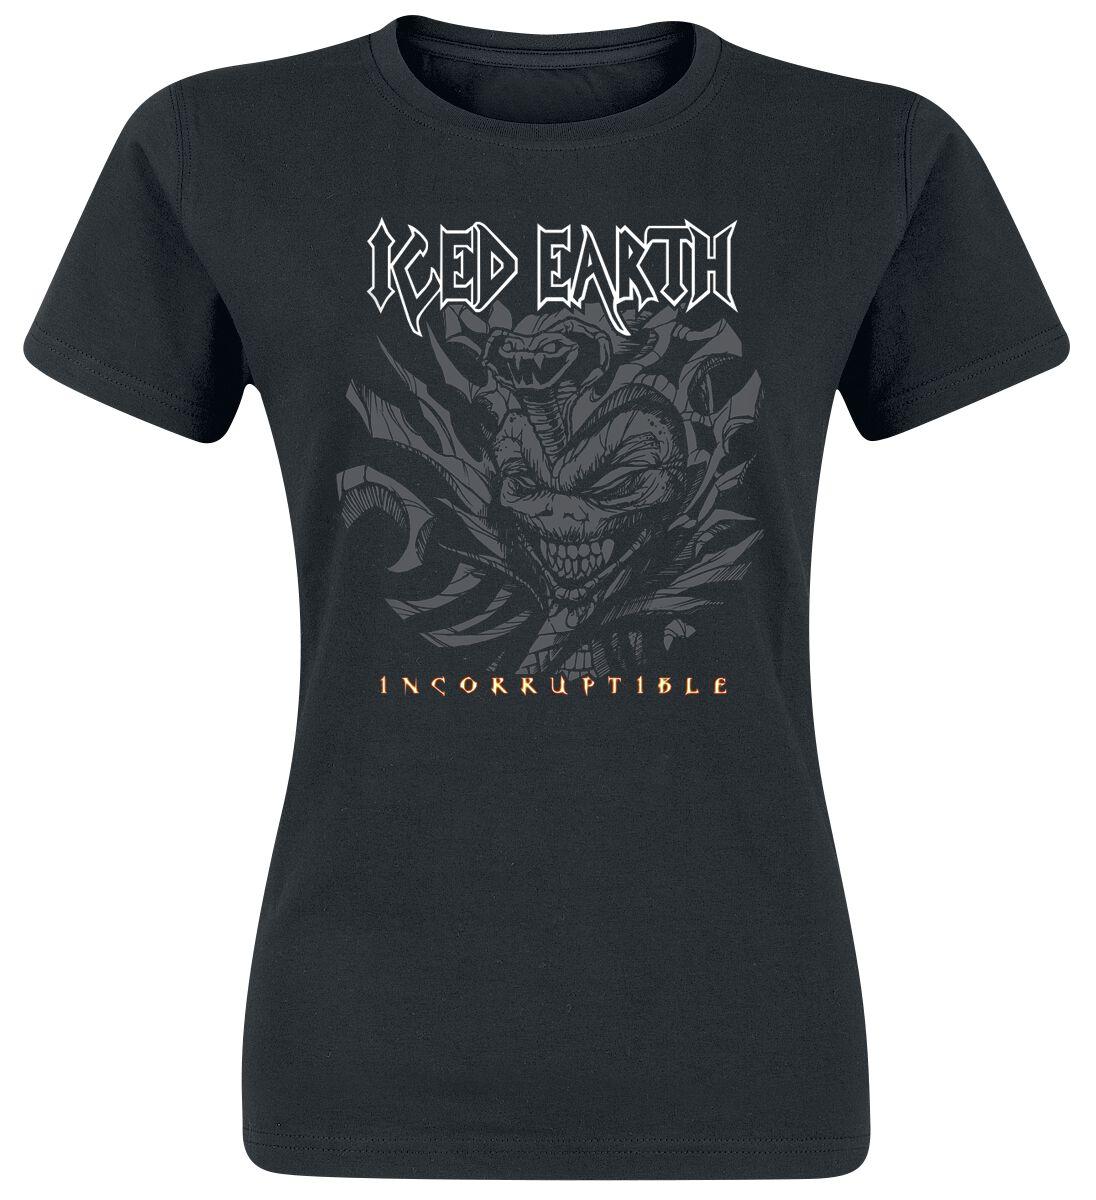 Zespoły - Koszulki - Koszulka damska Iced Earth Incorruptible Koszulka damska czarny - 358824